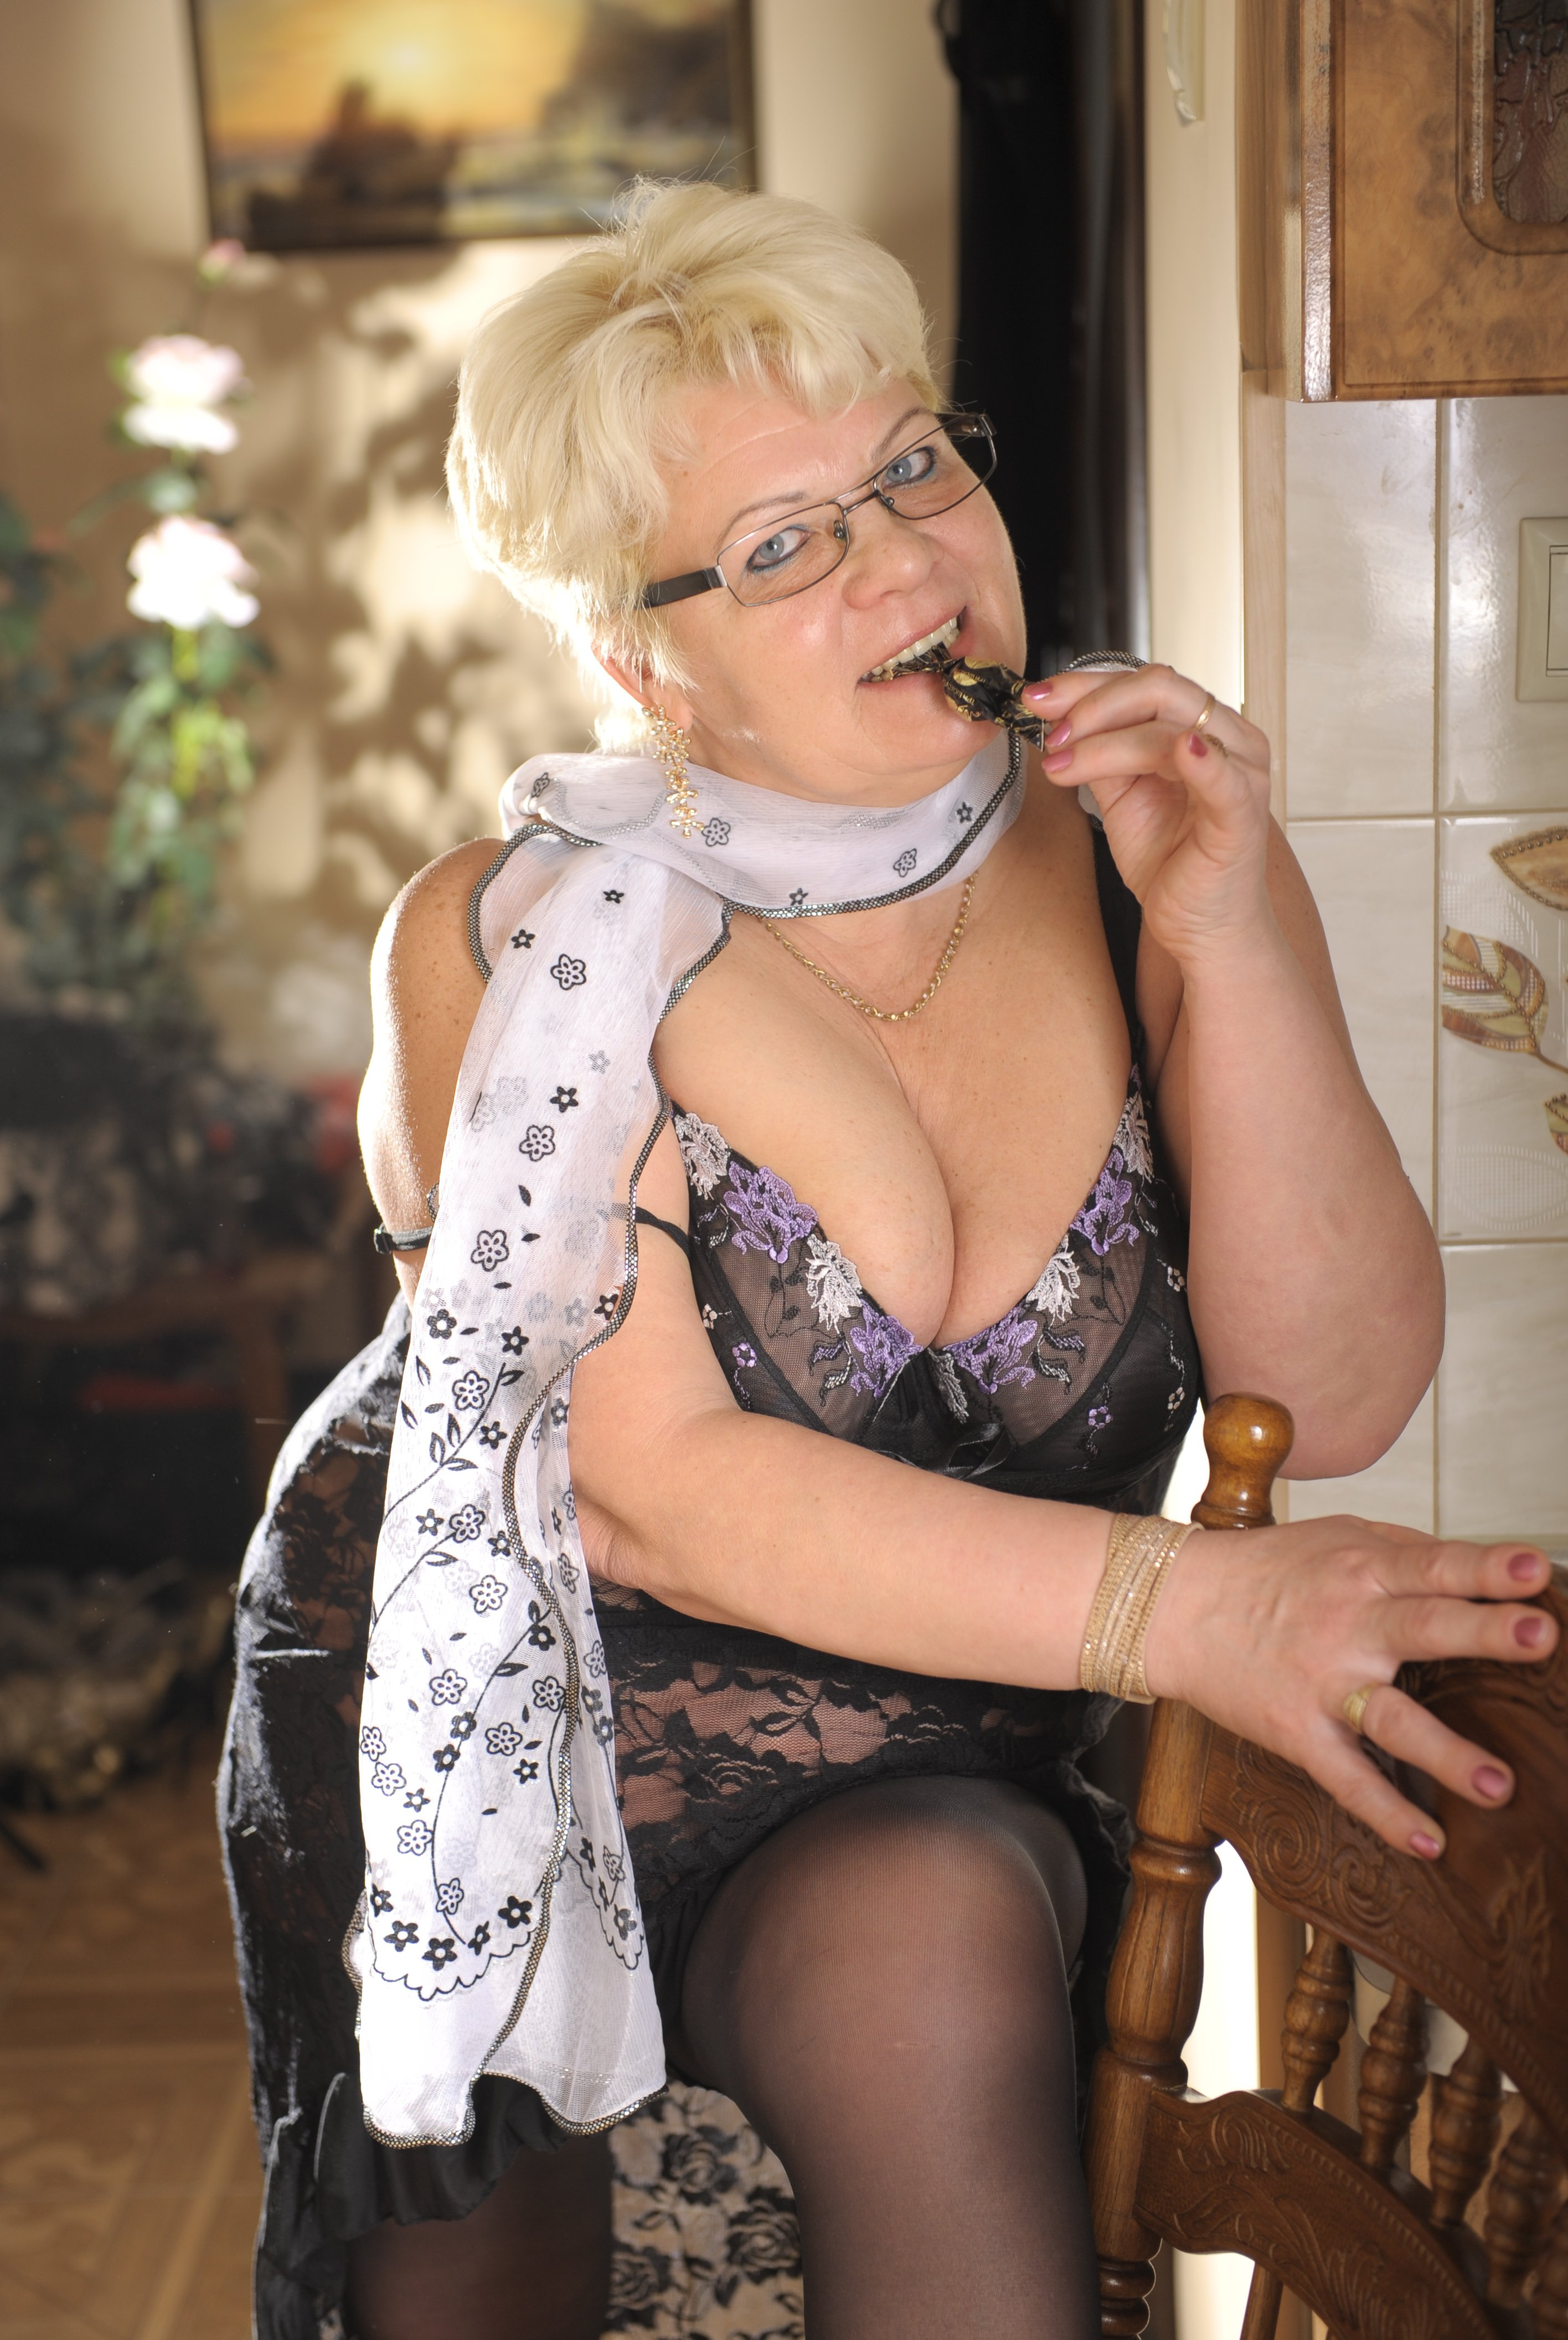 starie-anketi-individualok-samari-plyazhniy-seks-akvalangisti